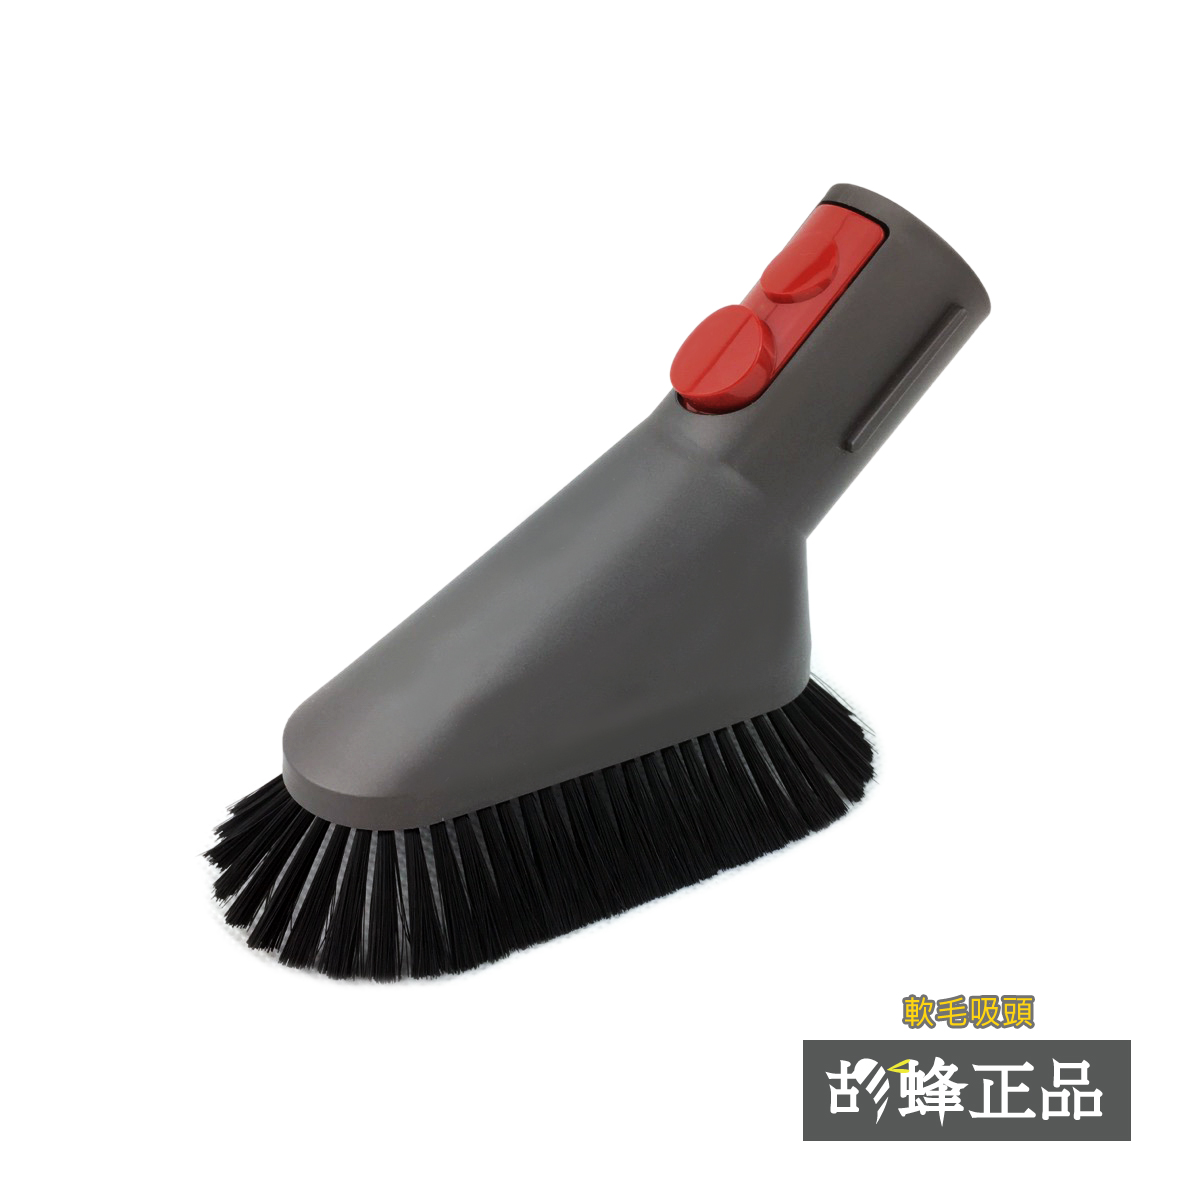 DYSON 原廠 V8 SV10 軟毛吸頭 小軟毛刷 吸頭 absolute motorhead fluffy